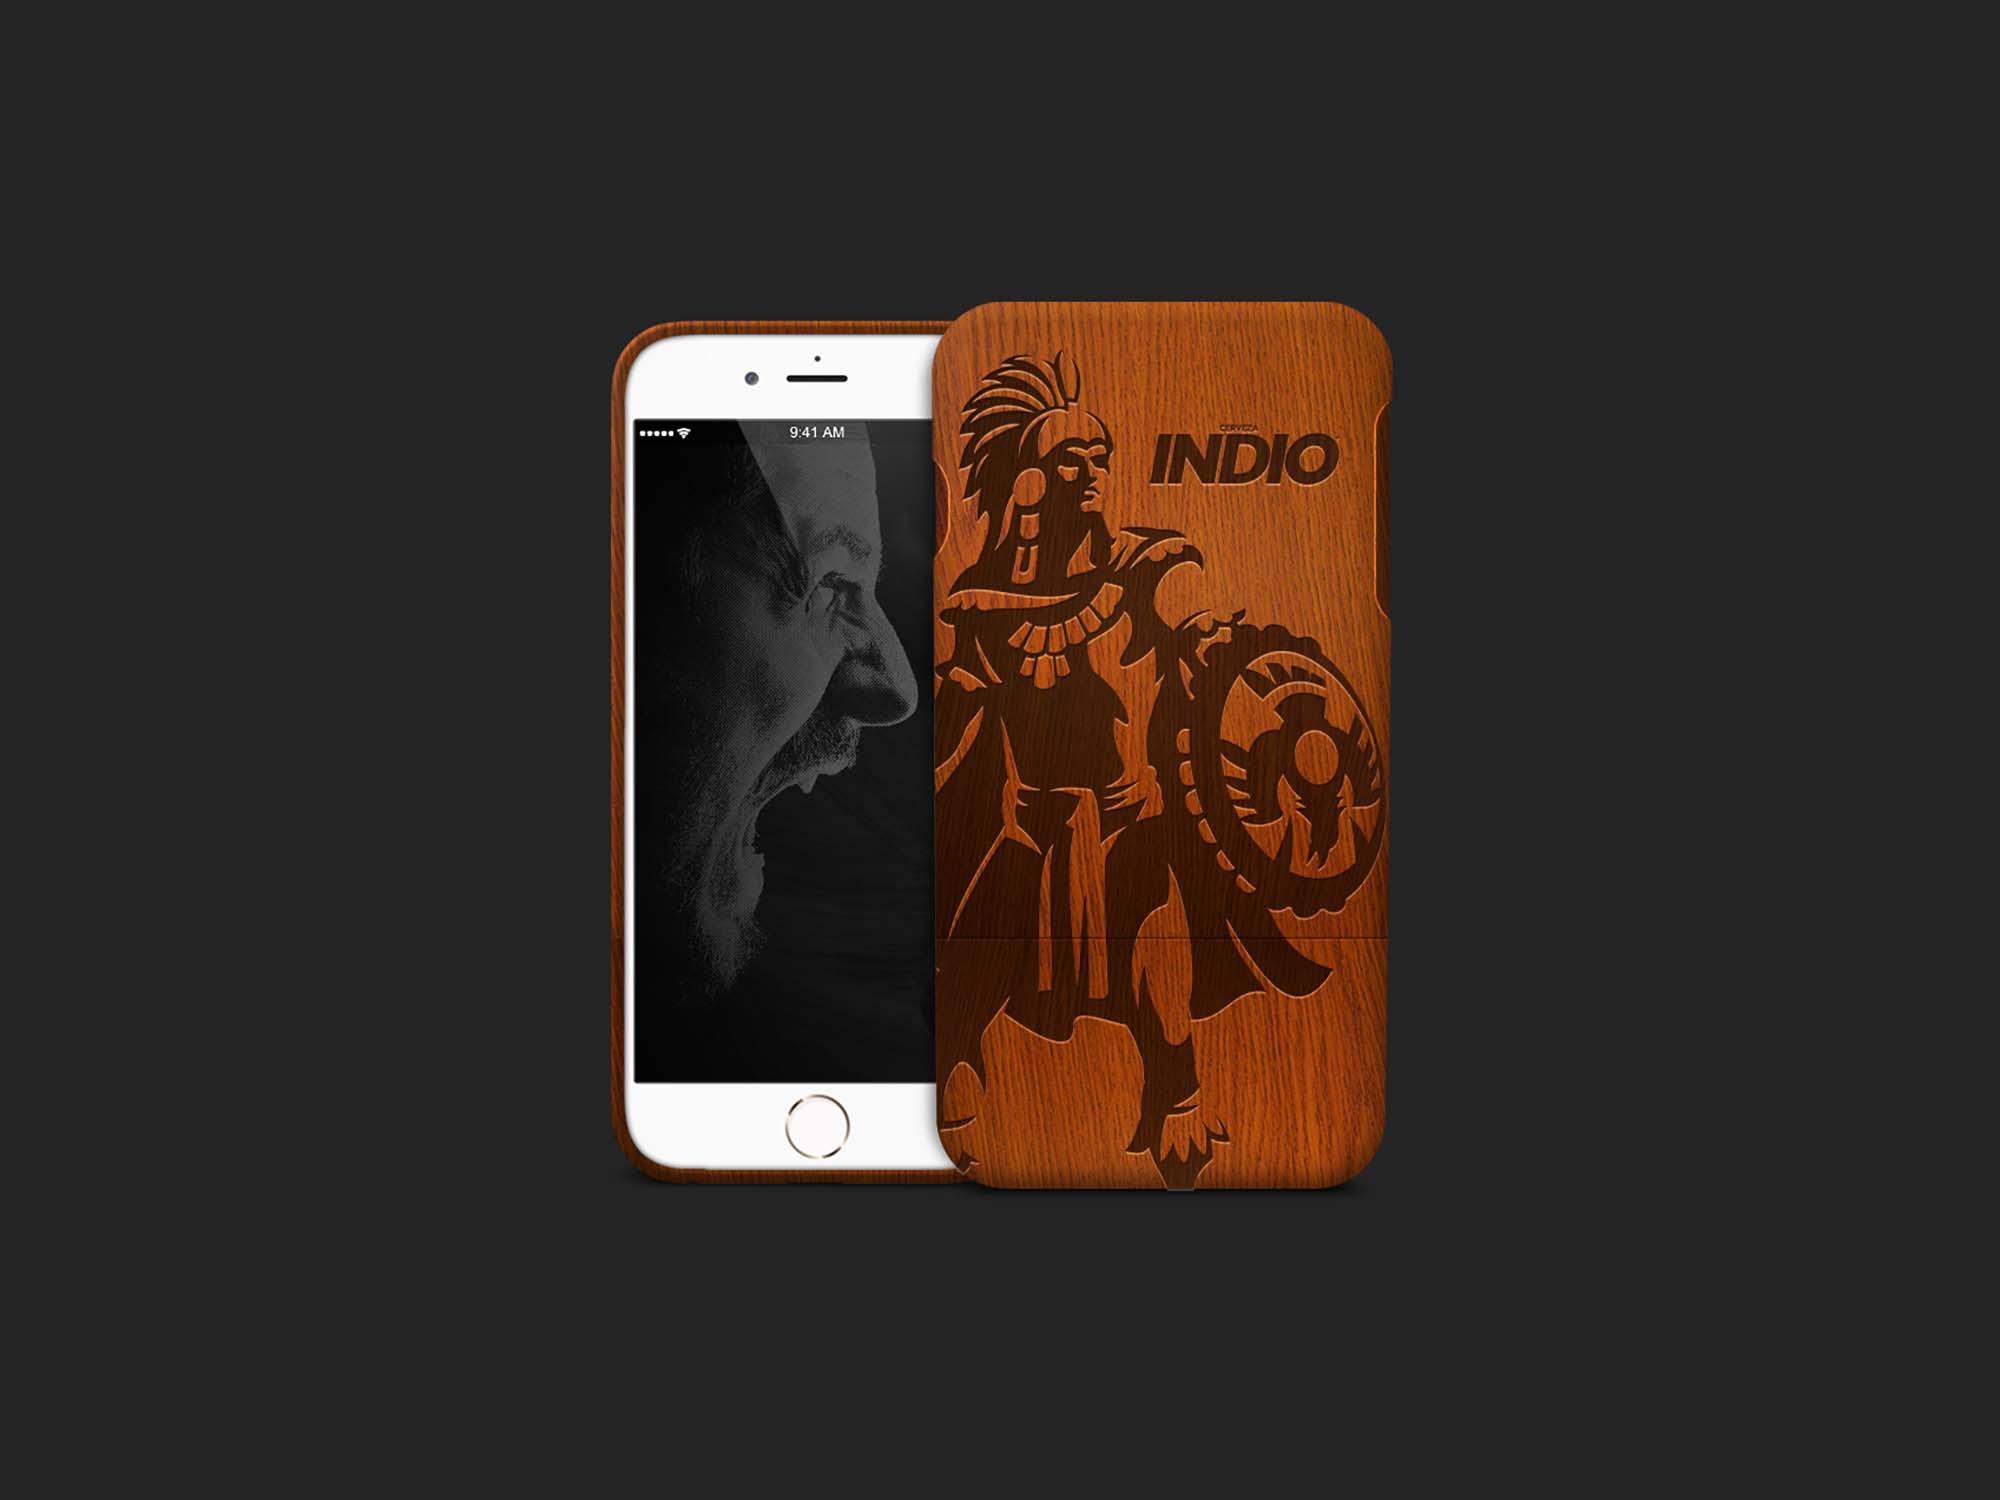 Bamboo Wood iPhone Case Mockup